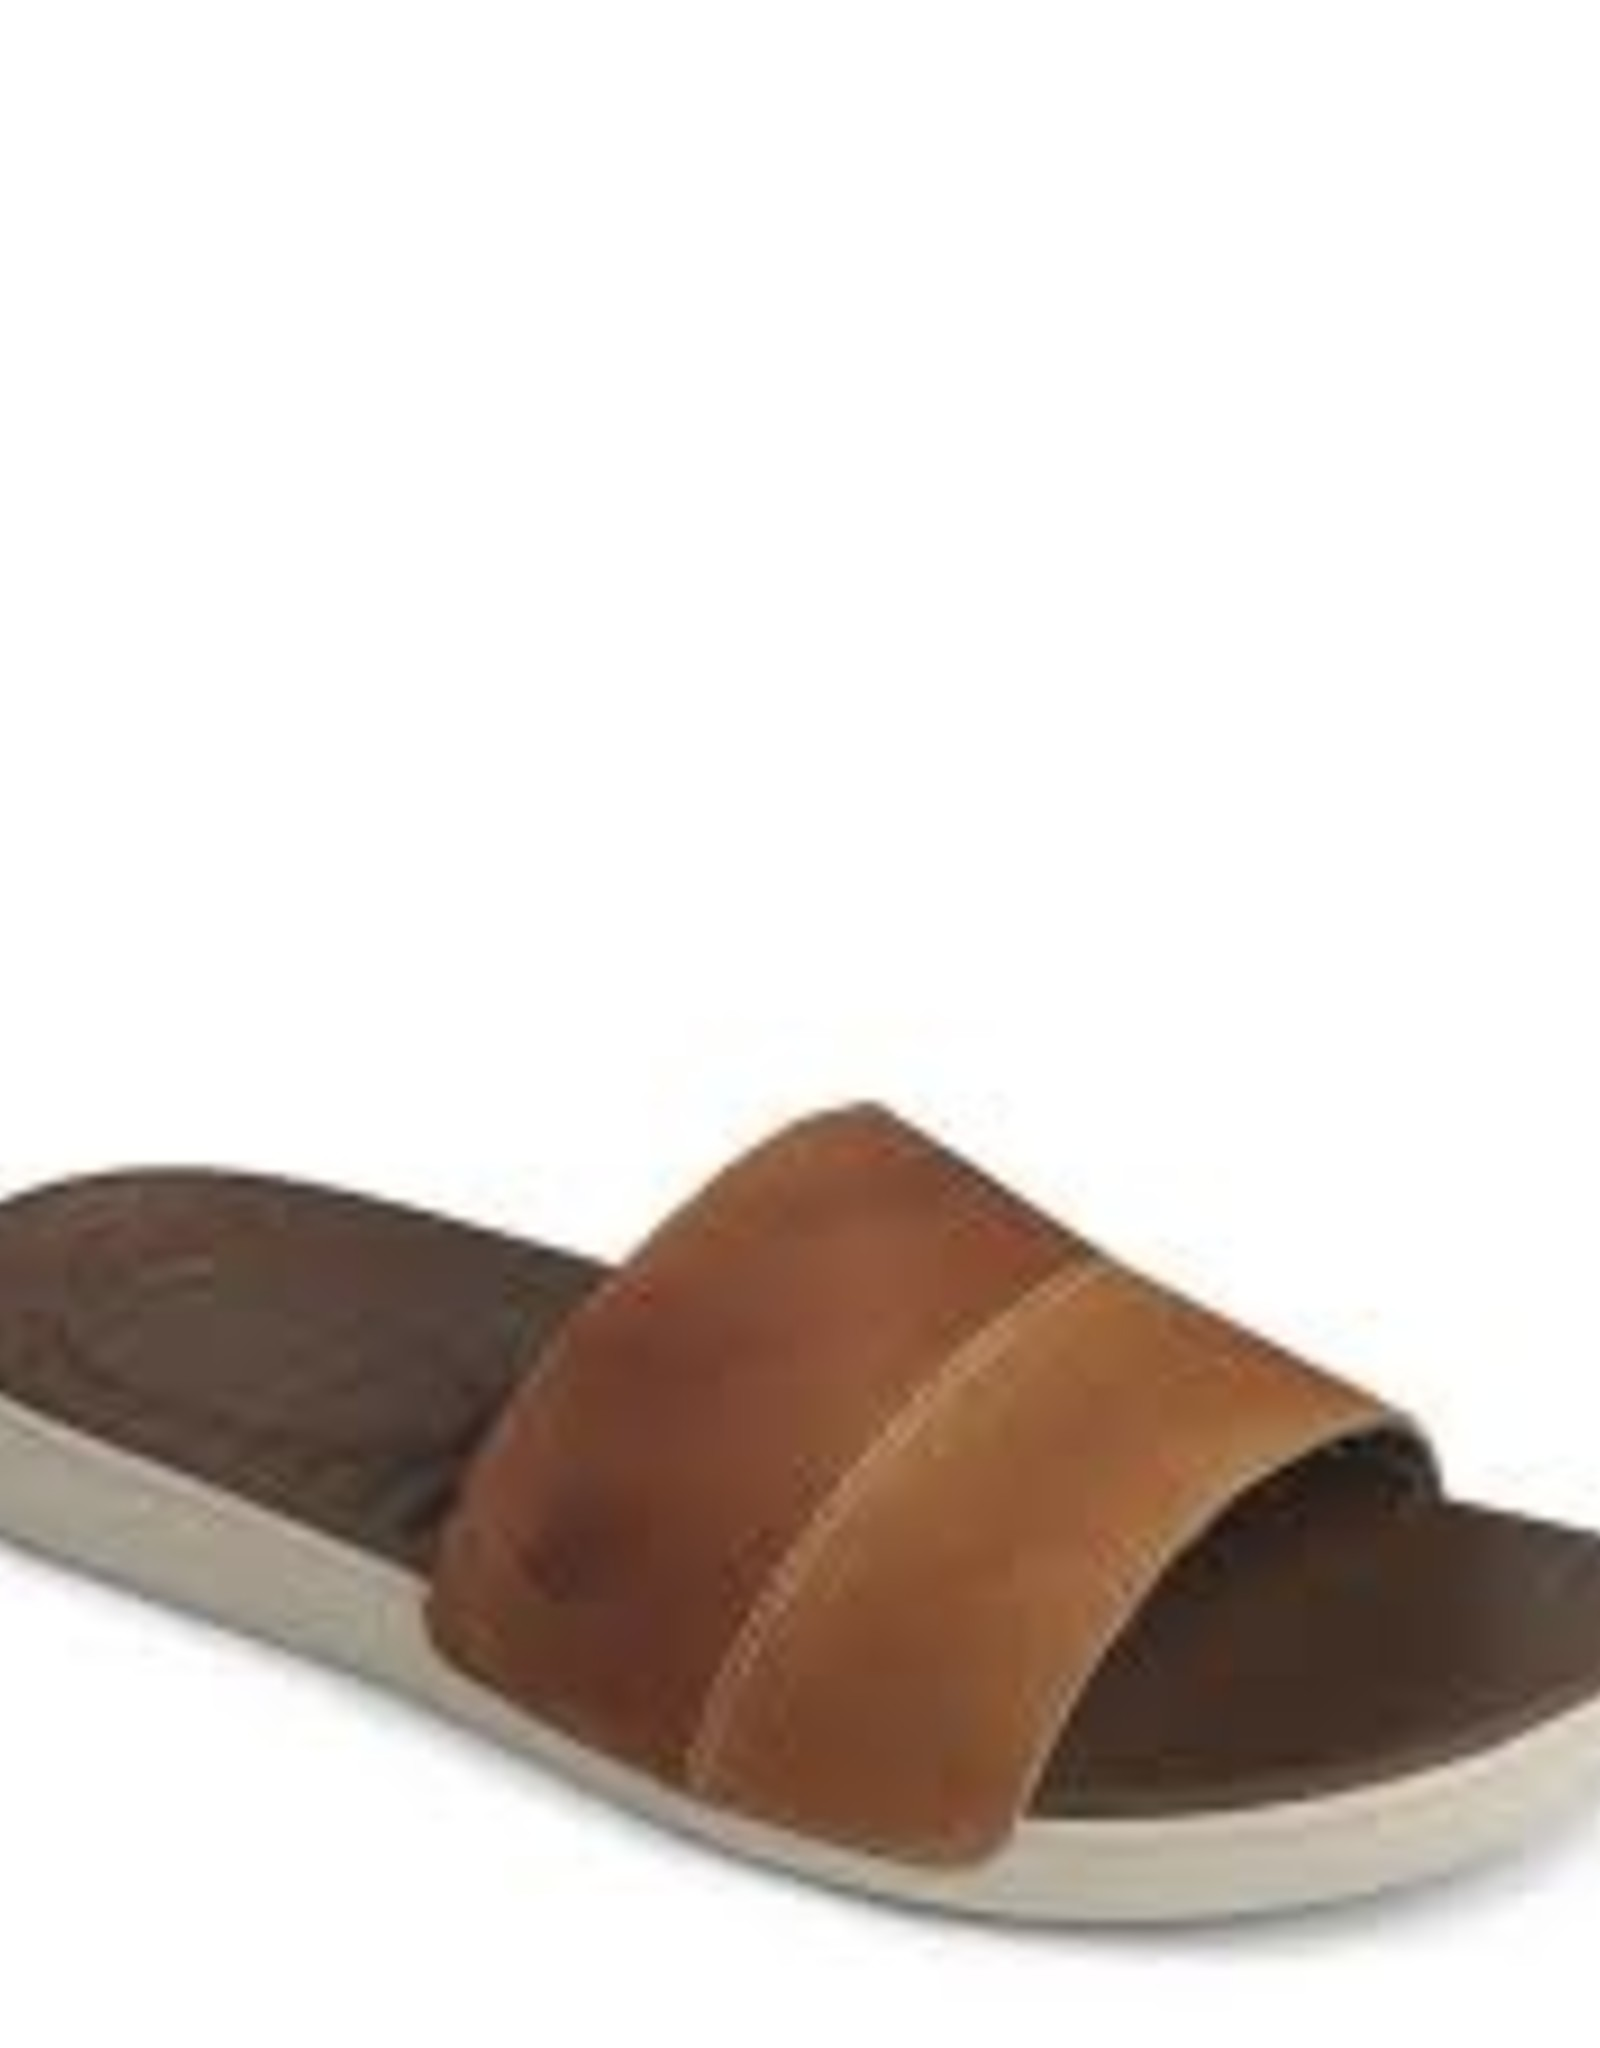 Sperry plushwave sandal